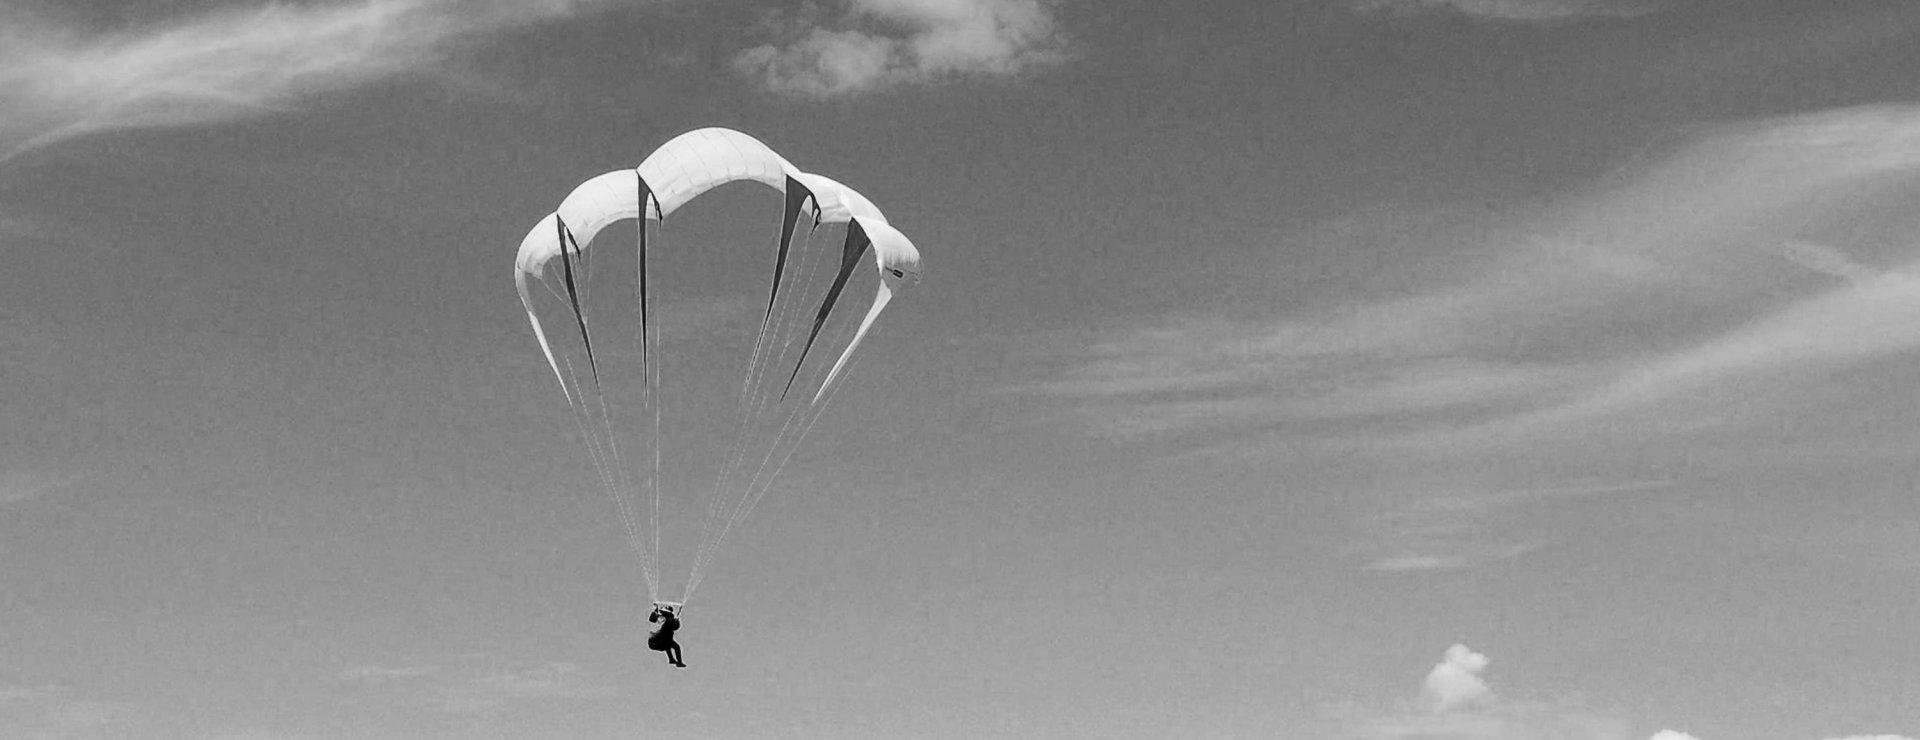 2pcs 21KN //4700lb Auto Locking Carabiner For Paraglider Paragliding Climbing